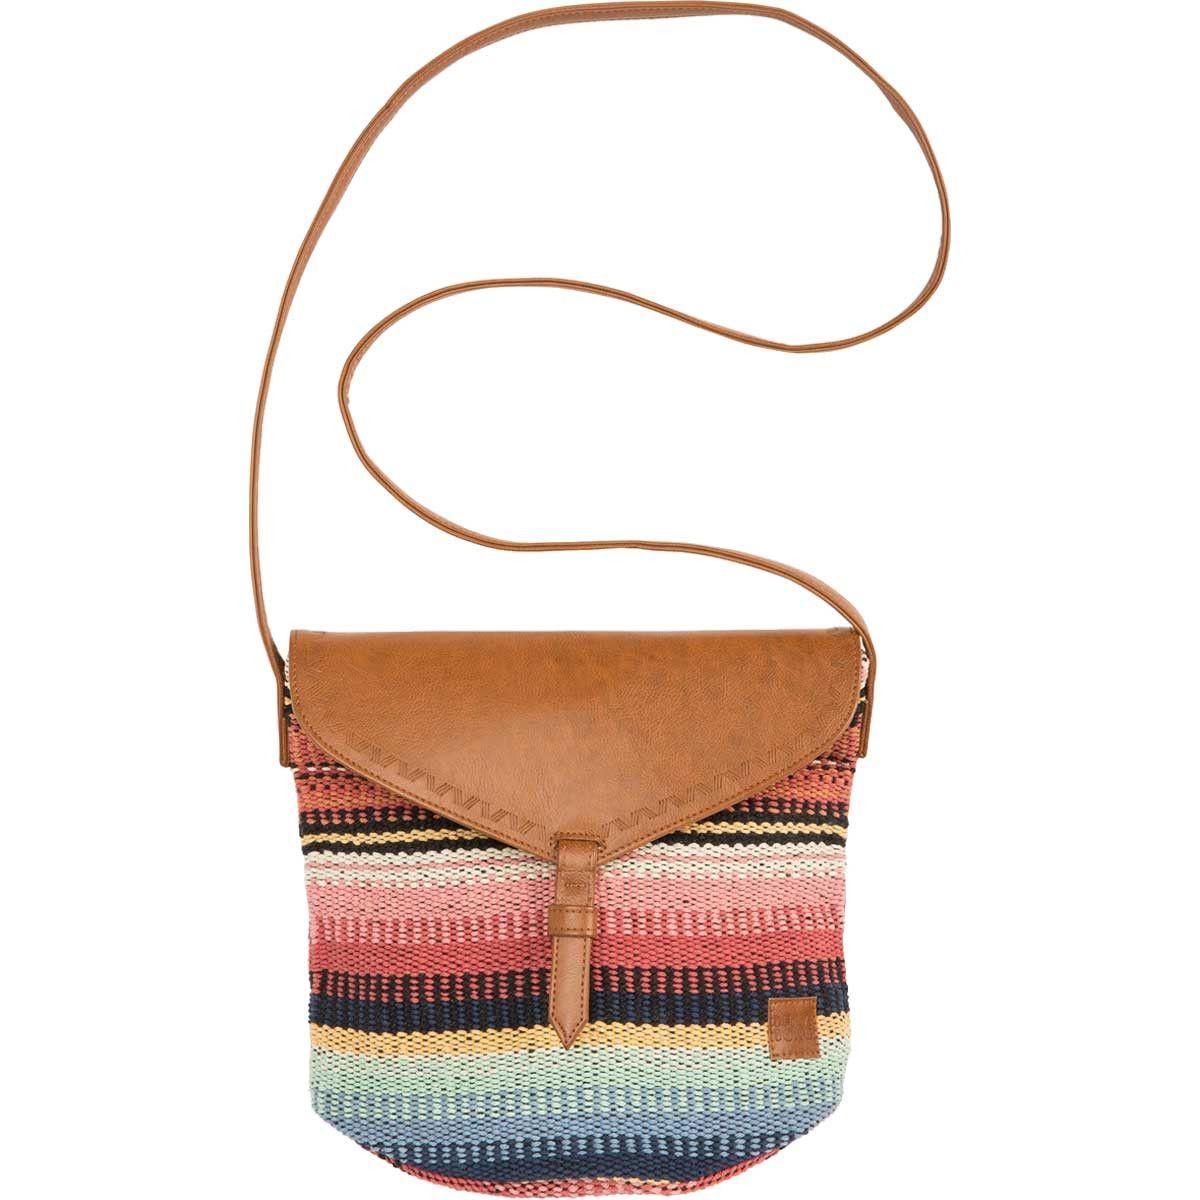 Billabong Leftover Moonrays Crossbody Bag from Chlotique